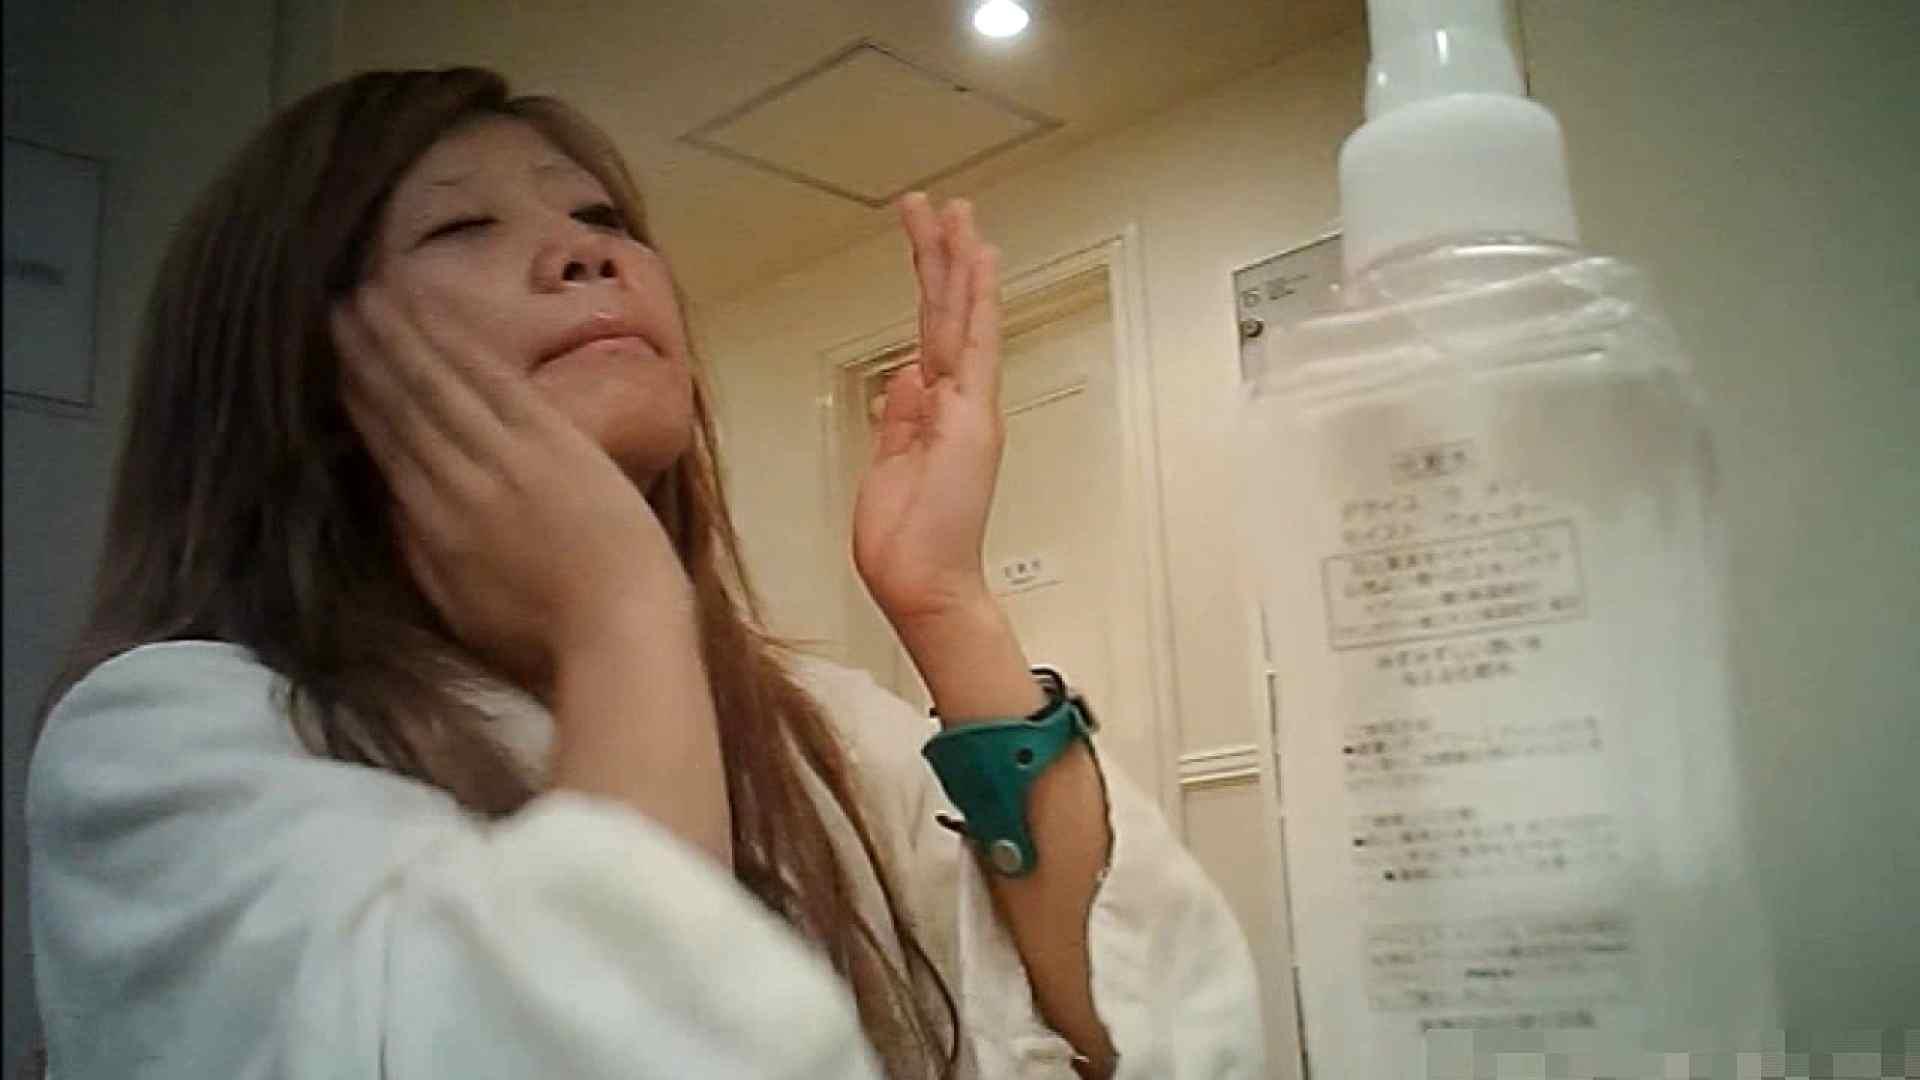 vol.7 【Mちゃん(入浴)】ブランド品査定士19歳 巨乳ギャル キャバ嬢の実態 エロ無料画像 81pic 6